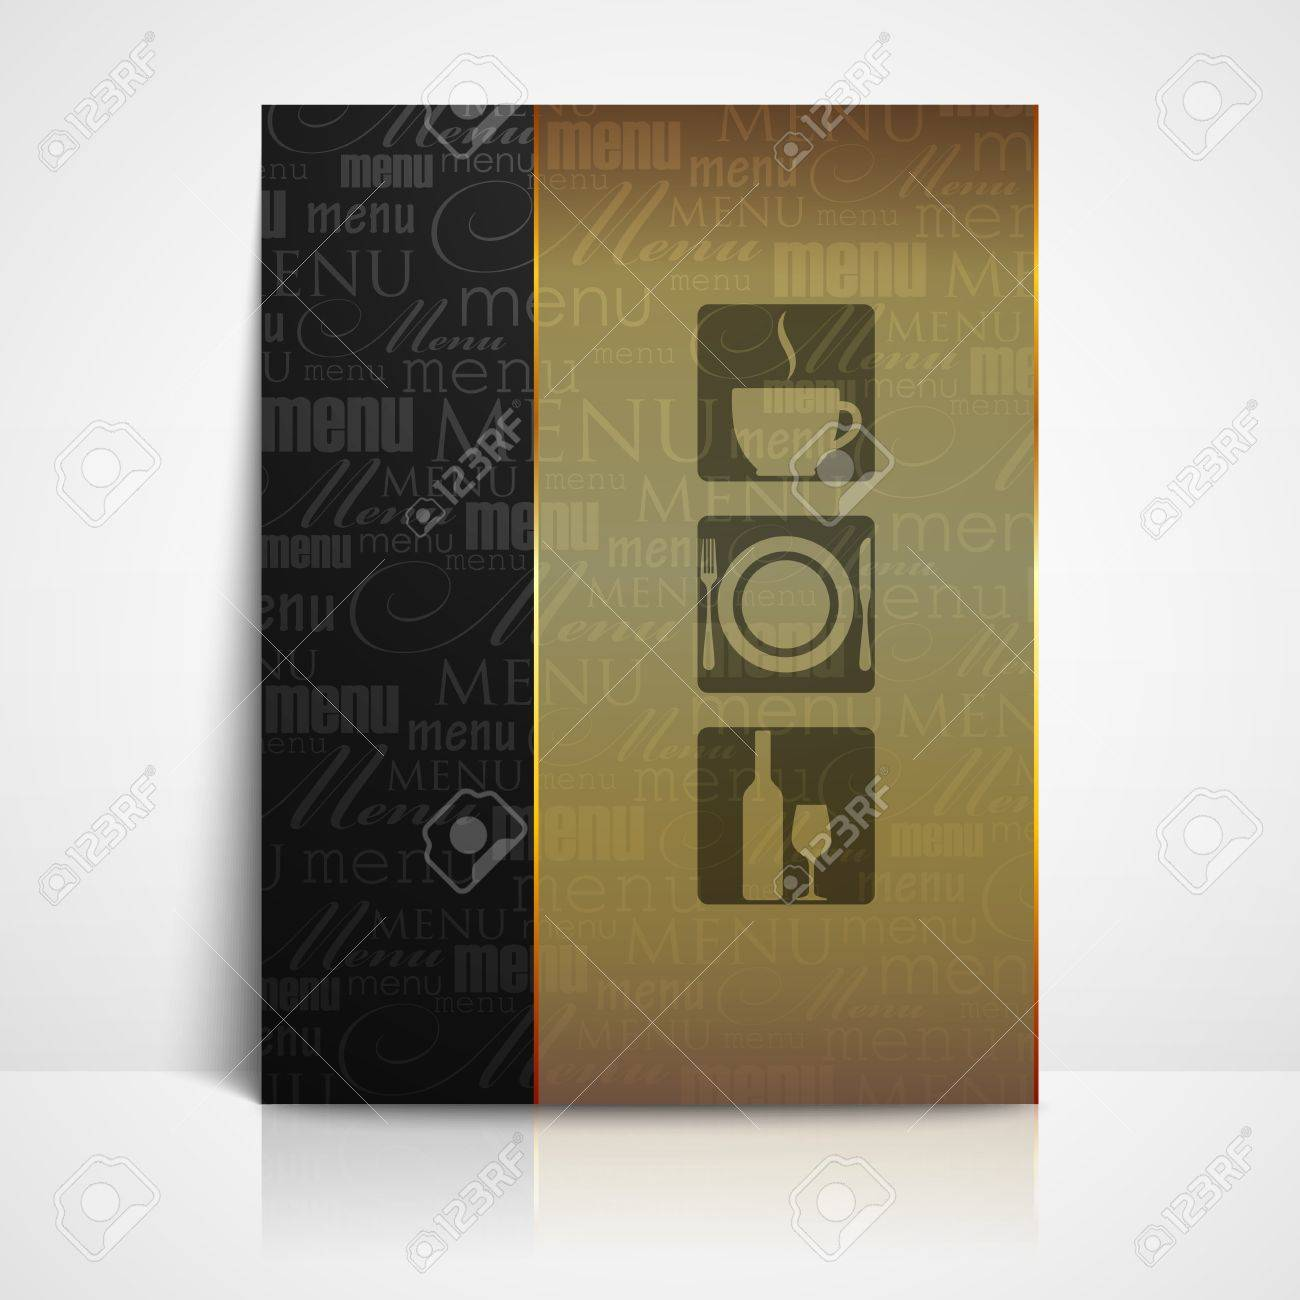 restaurant menu template Stock Vector - 21062286